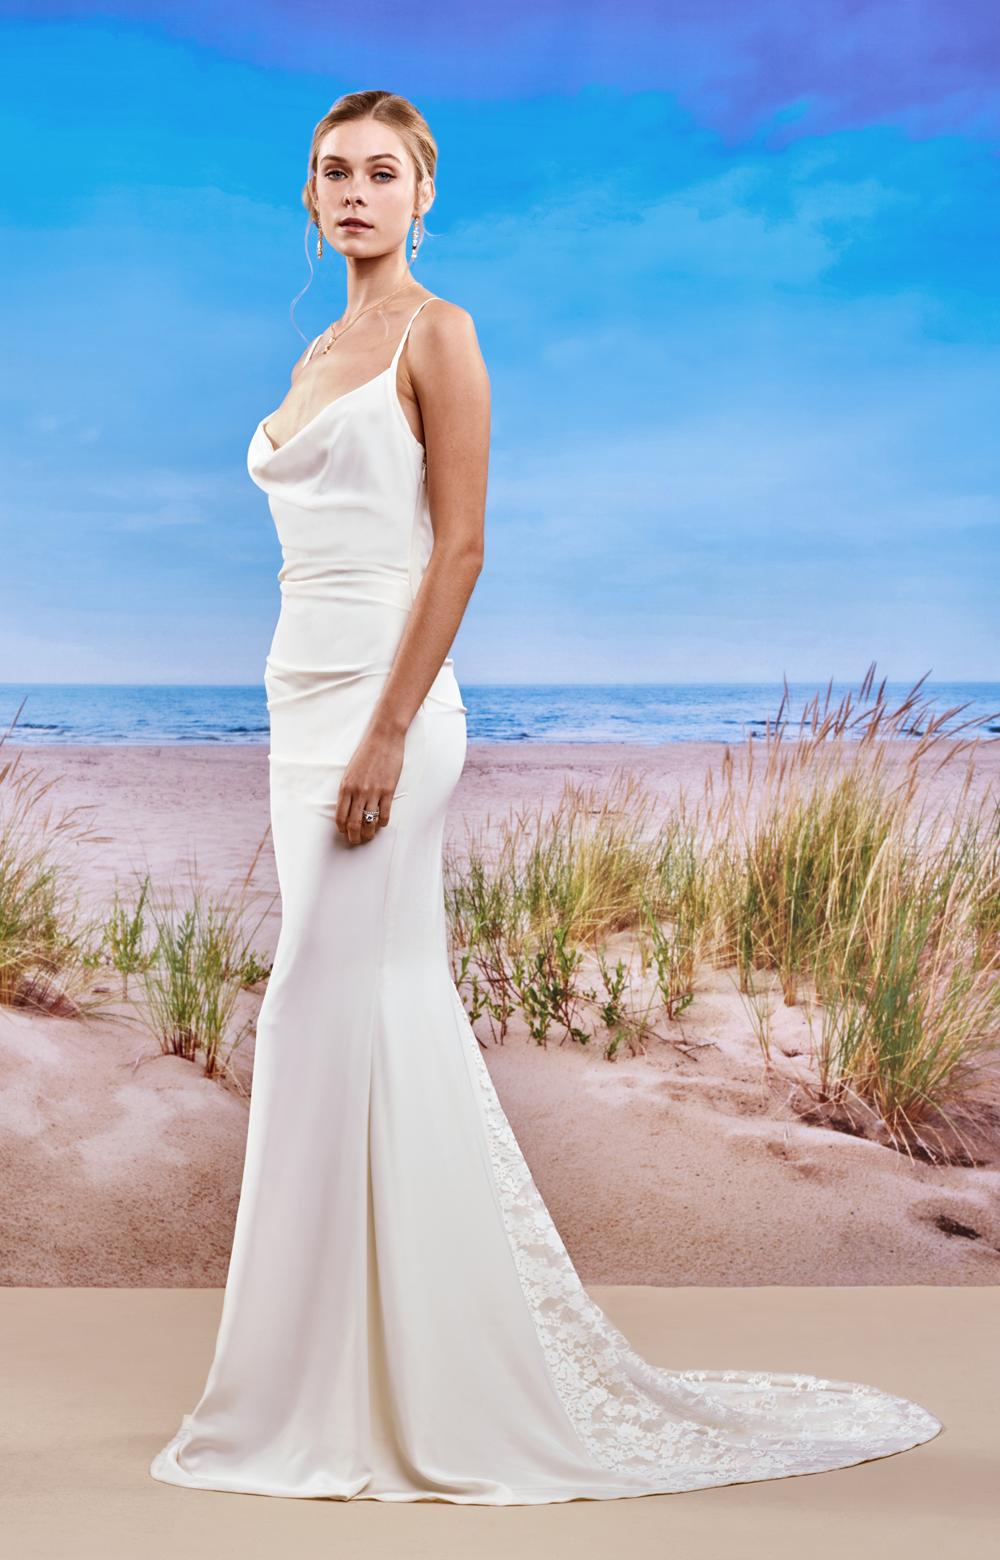 Hampton bridal gown nicole miller wedding dresses nicole miller hampton bridal gown ombrellifo Gallery